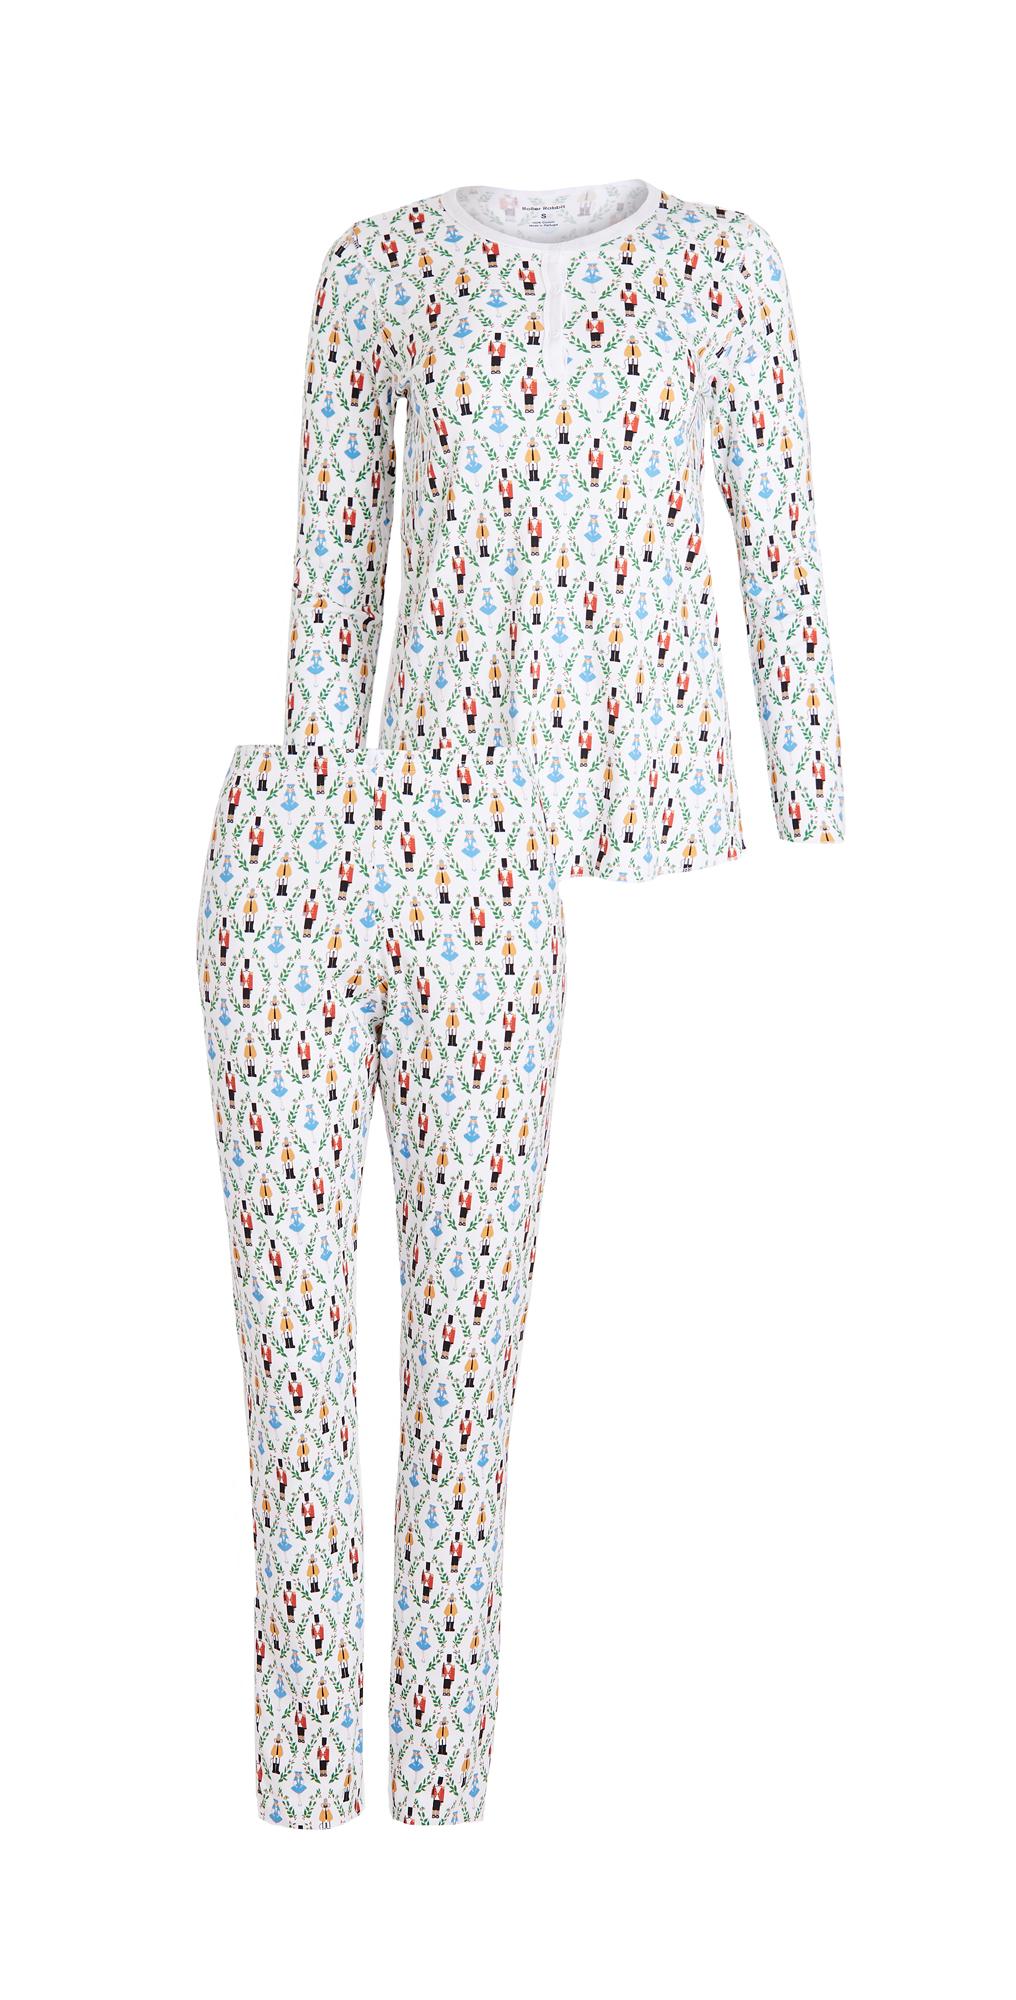 Roller Rabbit Sugar Plum Party Pajama Set